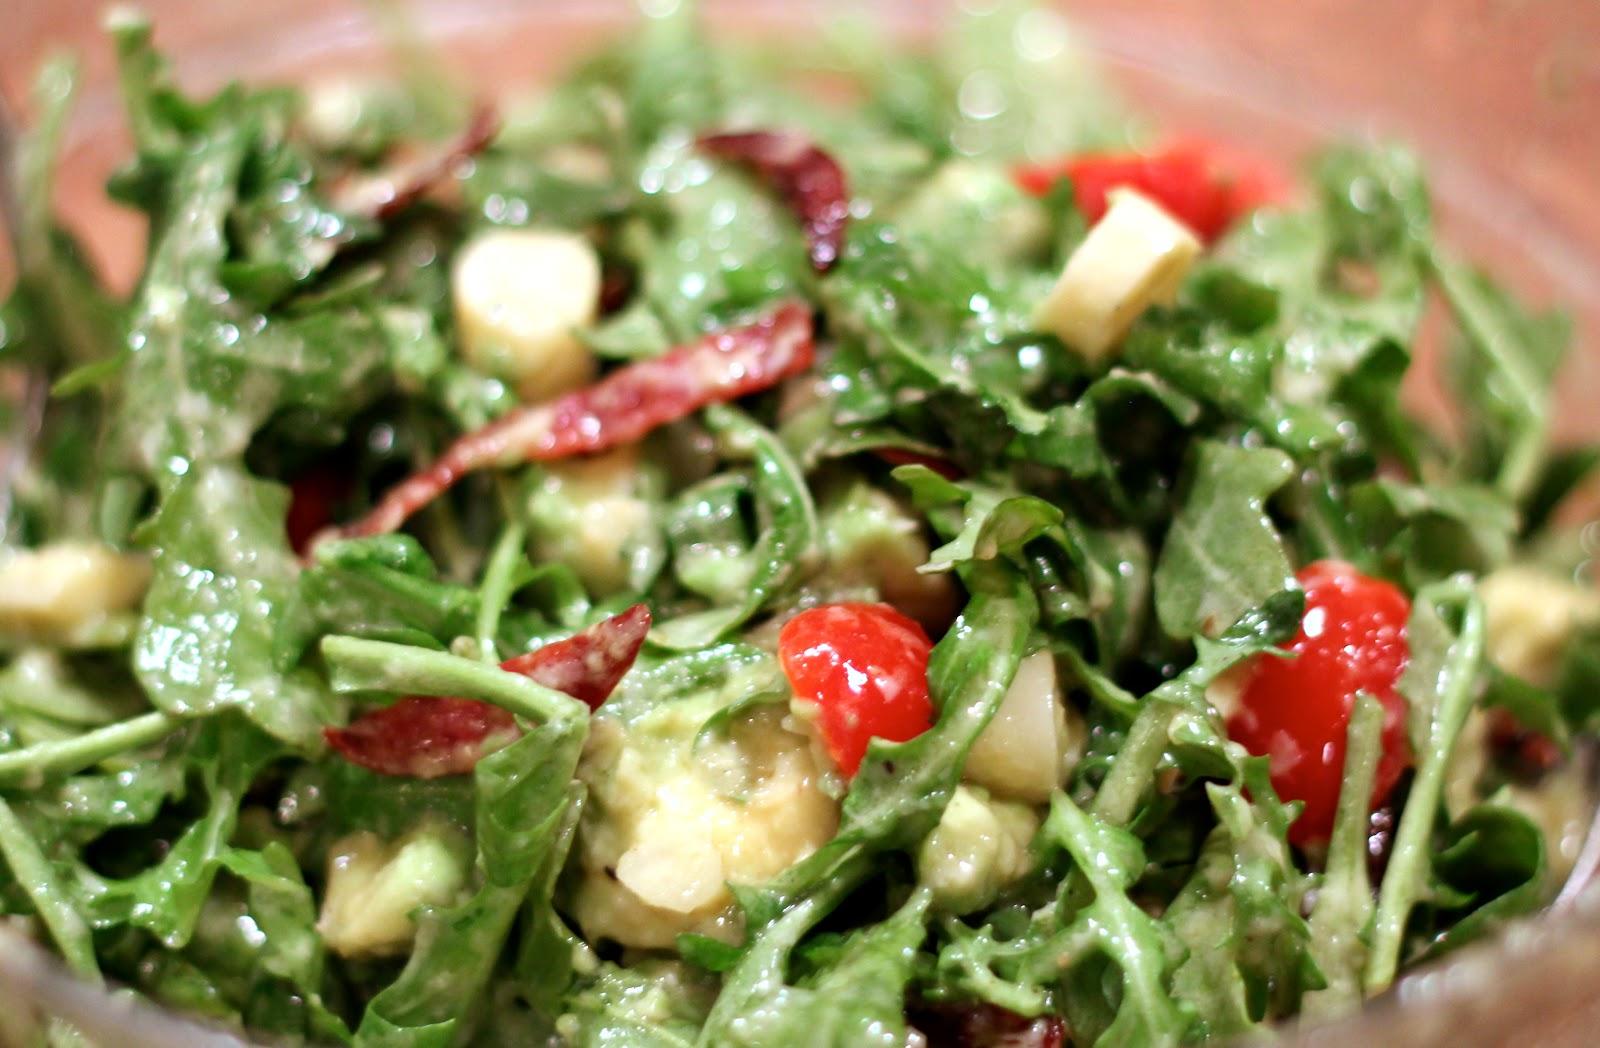 Imperfect Polish: Creamy Parmesan Arugula Salad with Crispy Salami